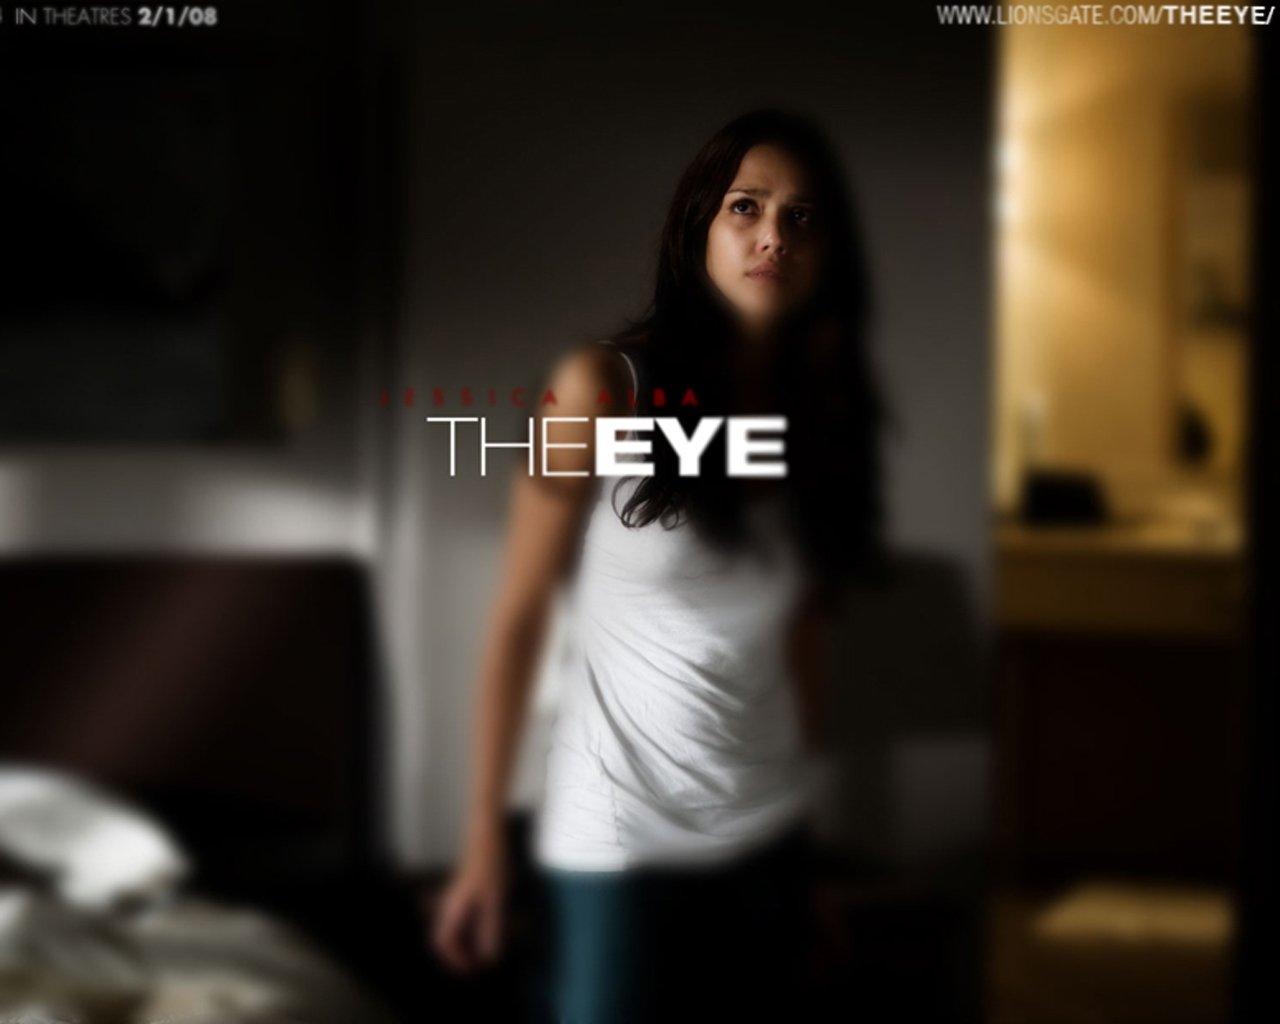 07947_The_Eye_Wallpaper_1280_001_122_1198lo.jpg